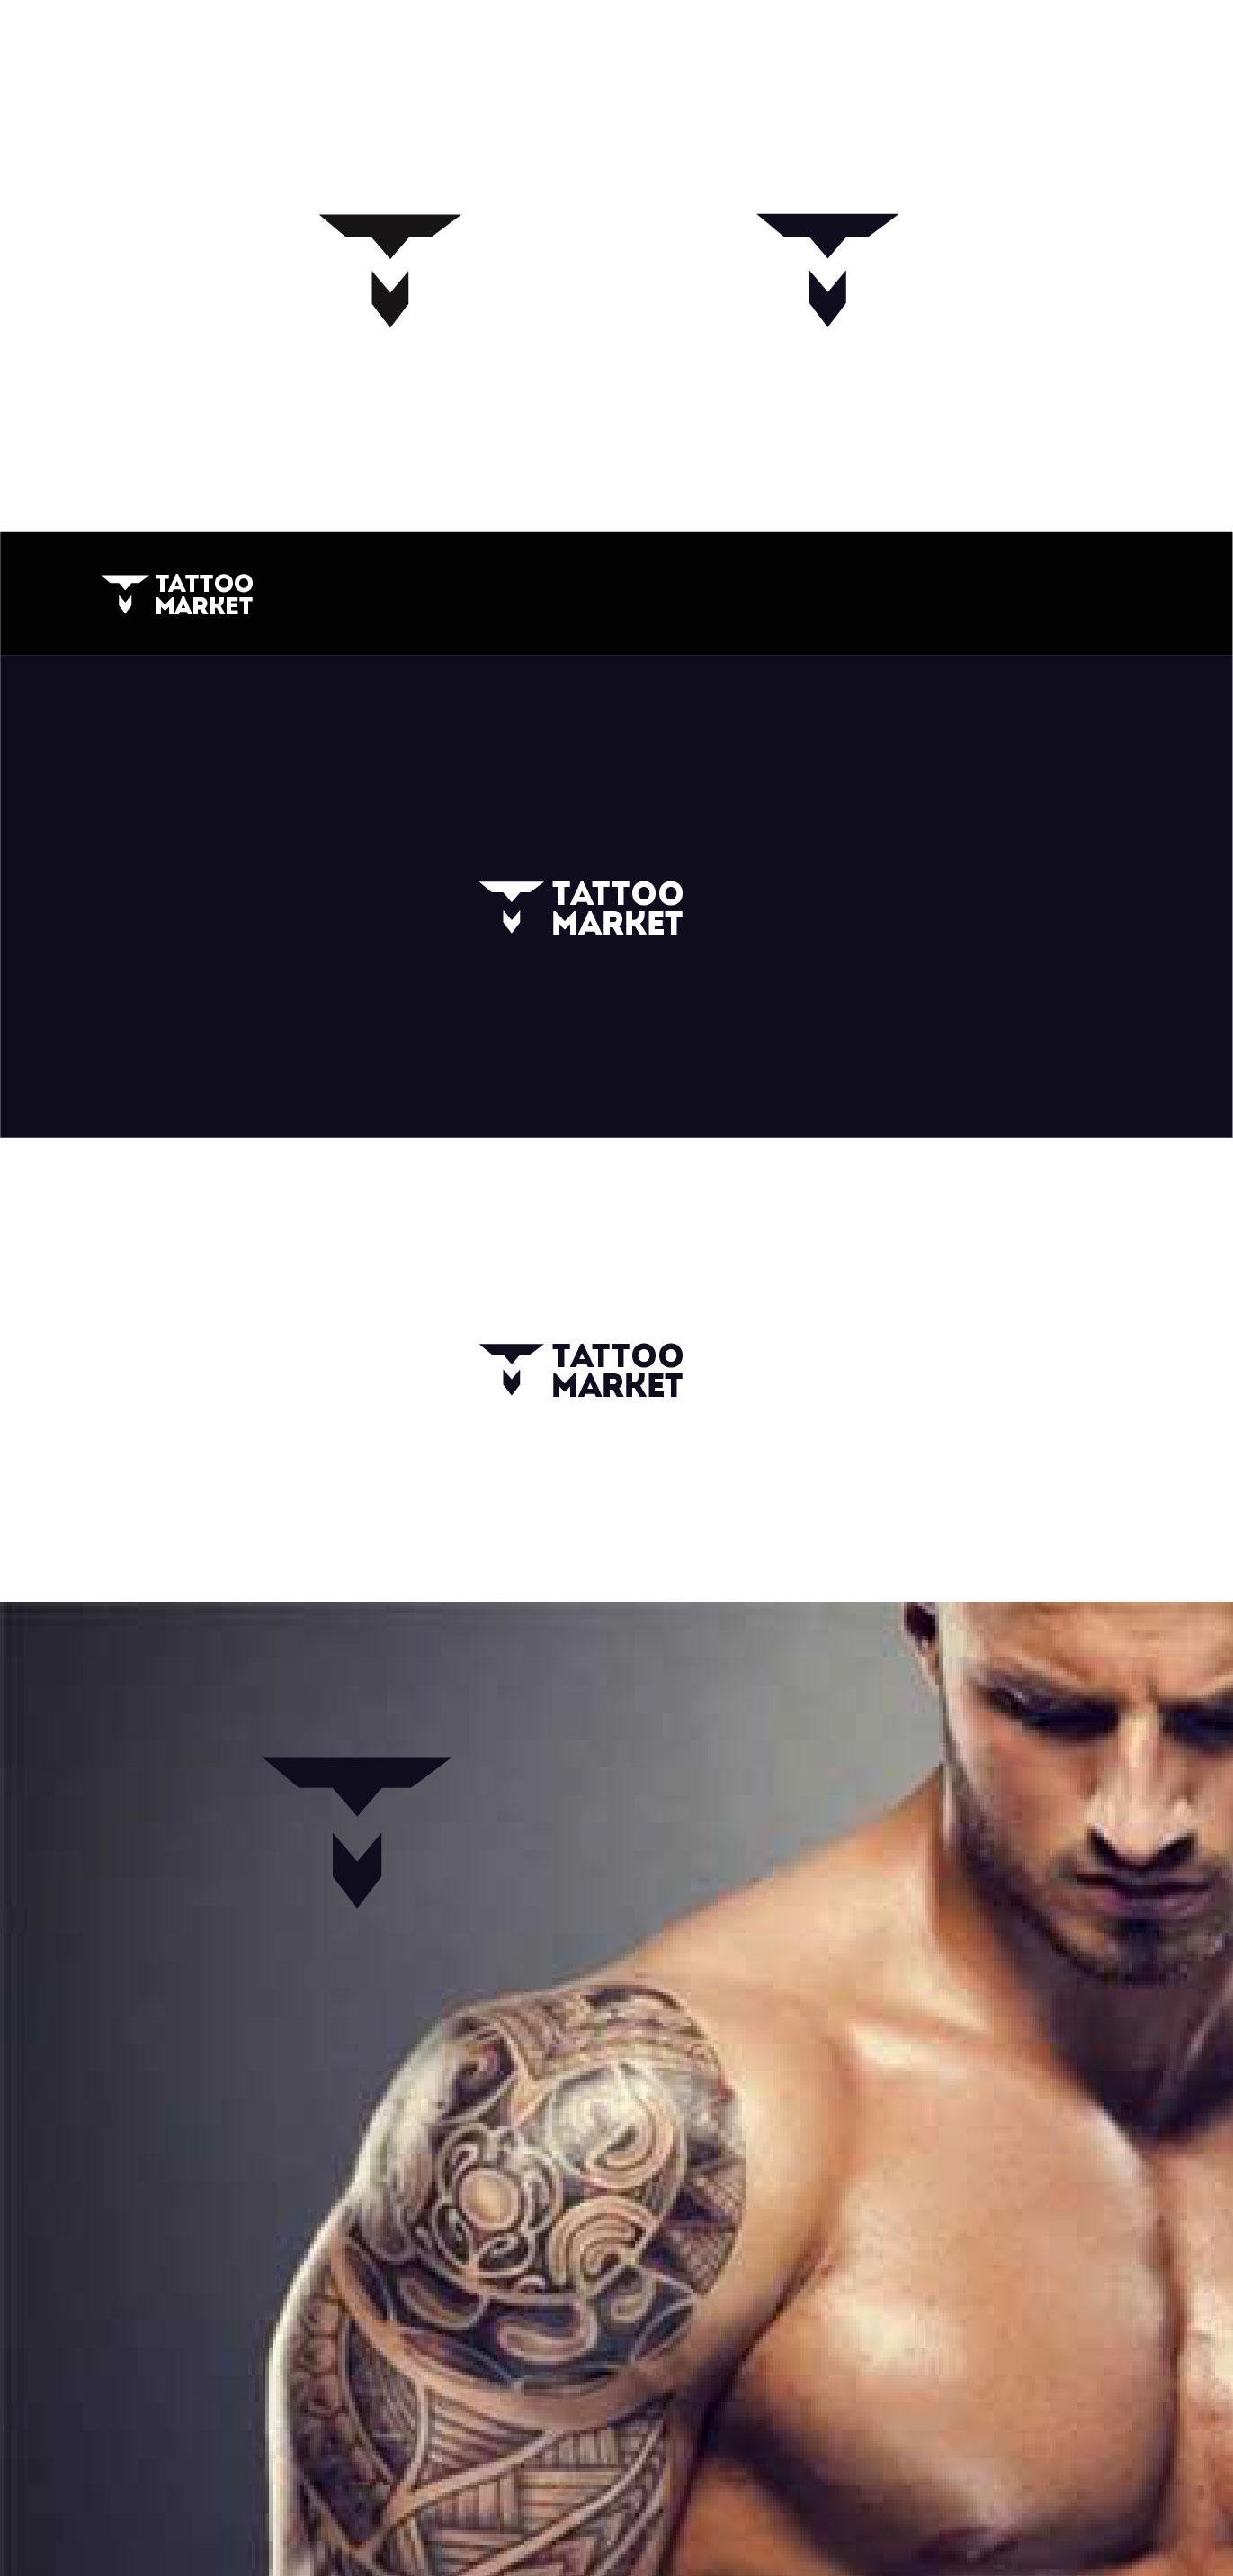 Редизайн логотипа магазина тату оборудования TattooMarket.ru фото f_5035c48cdcb24c31.jpg